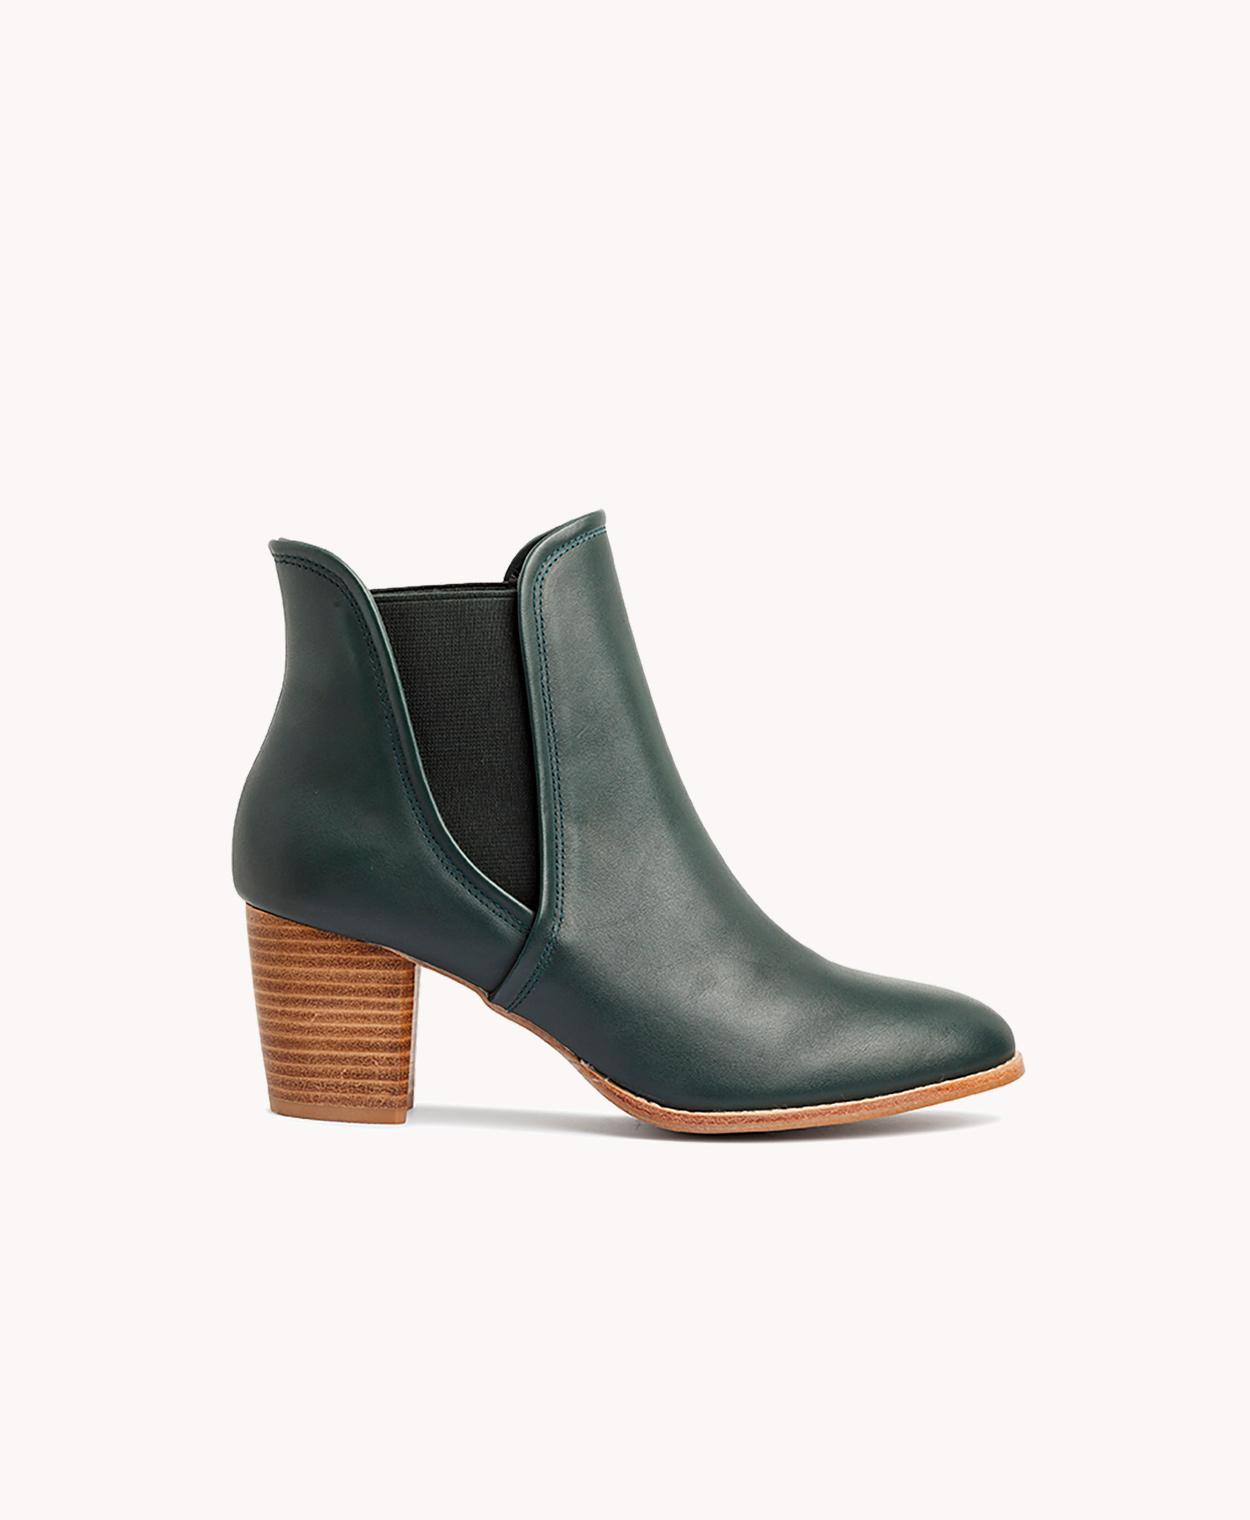 ae721d05118 Black Ankle Boots | Shop Womens Ankle Boots | Merchant